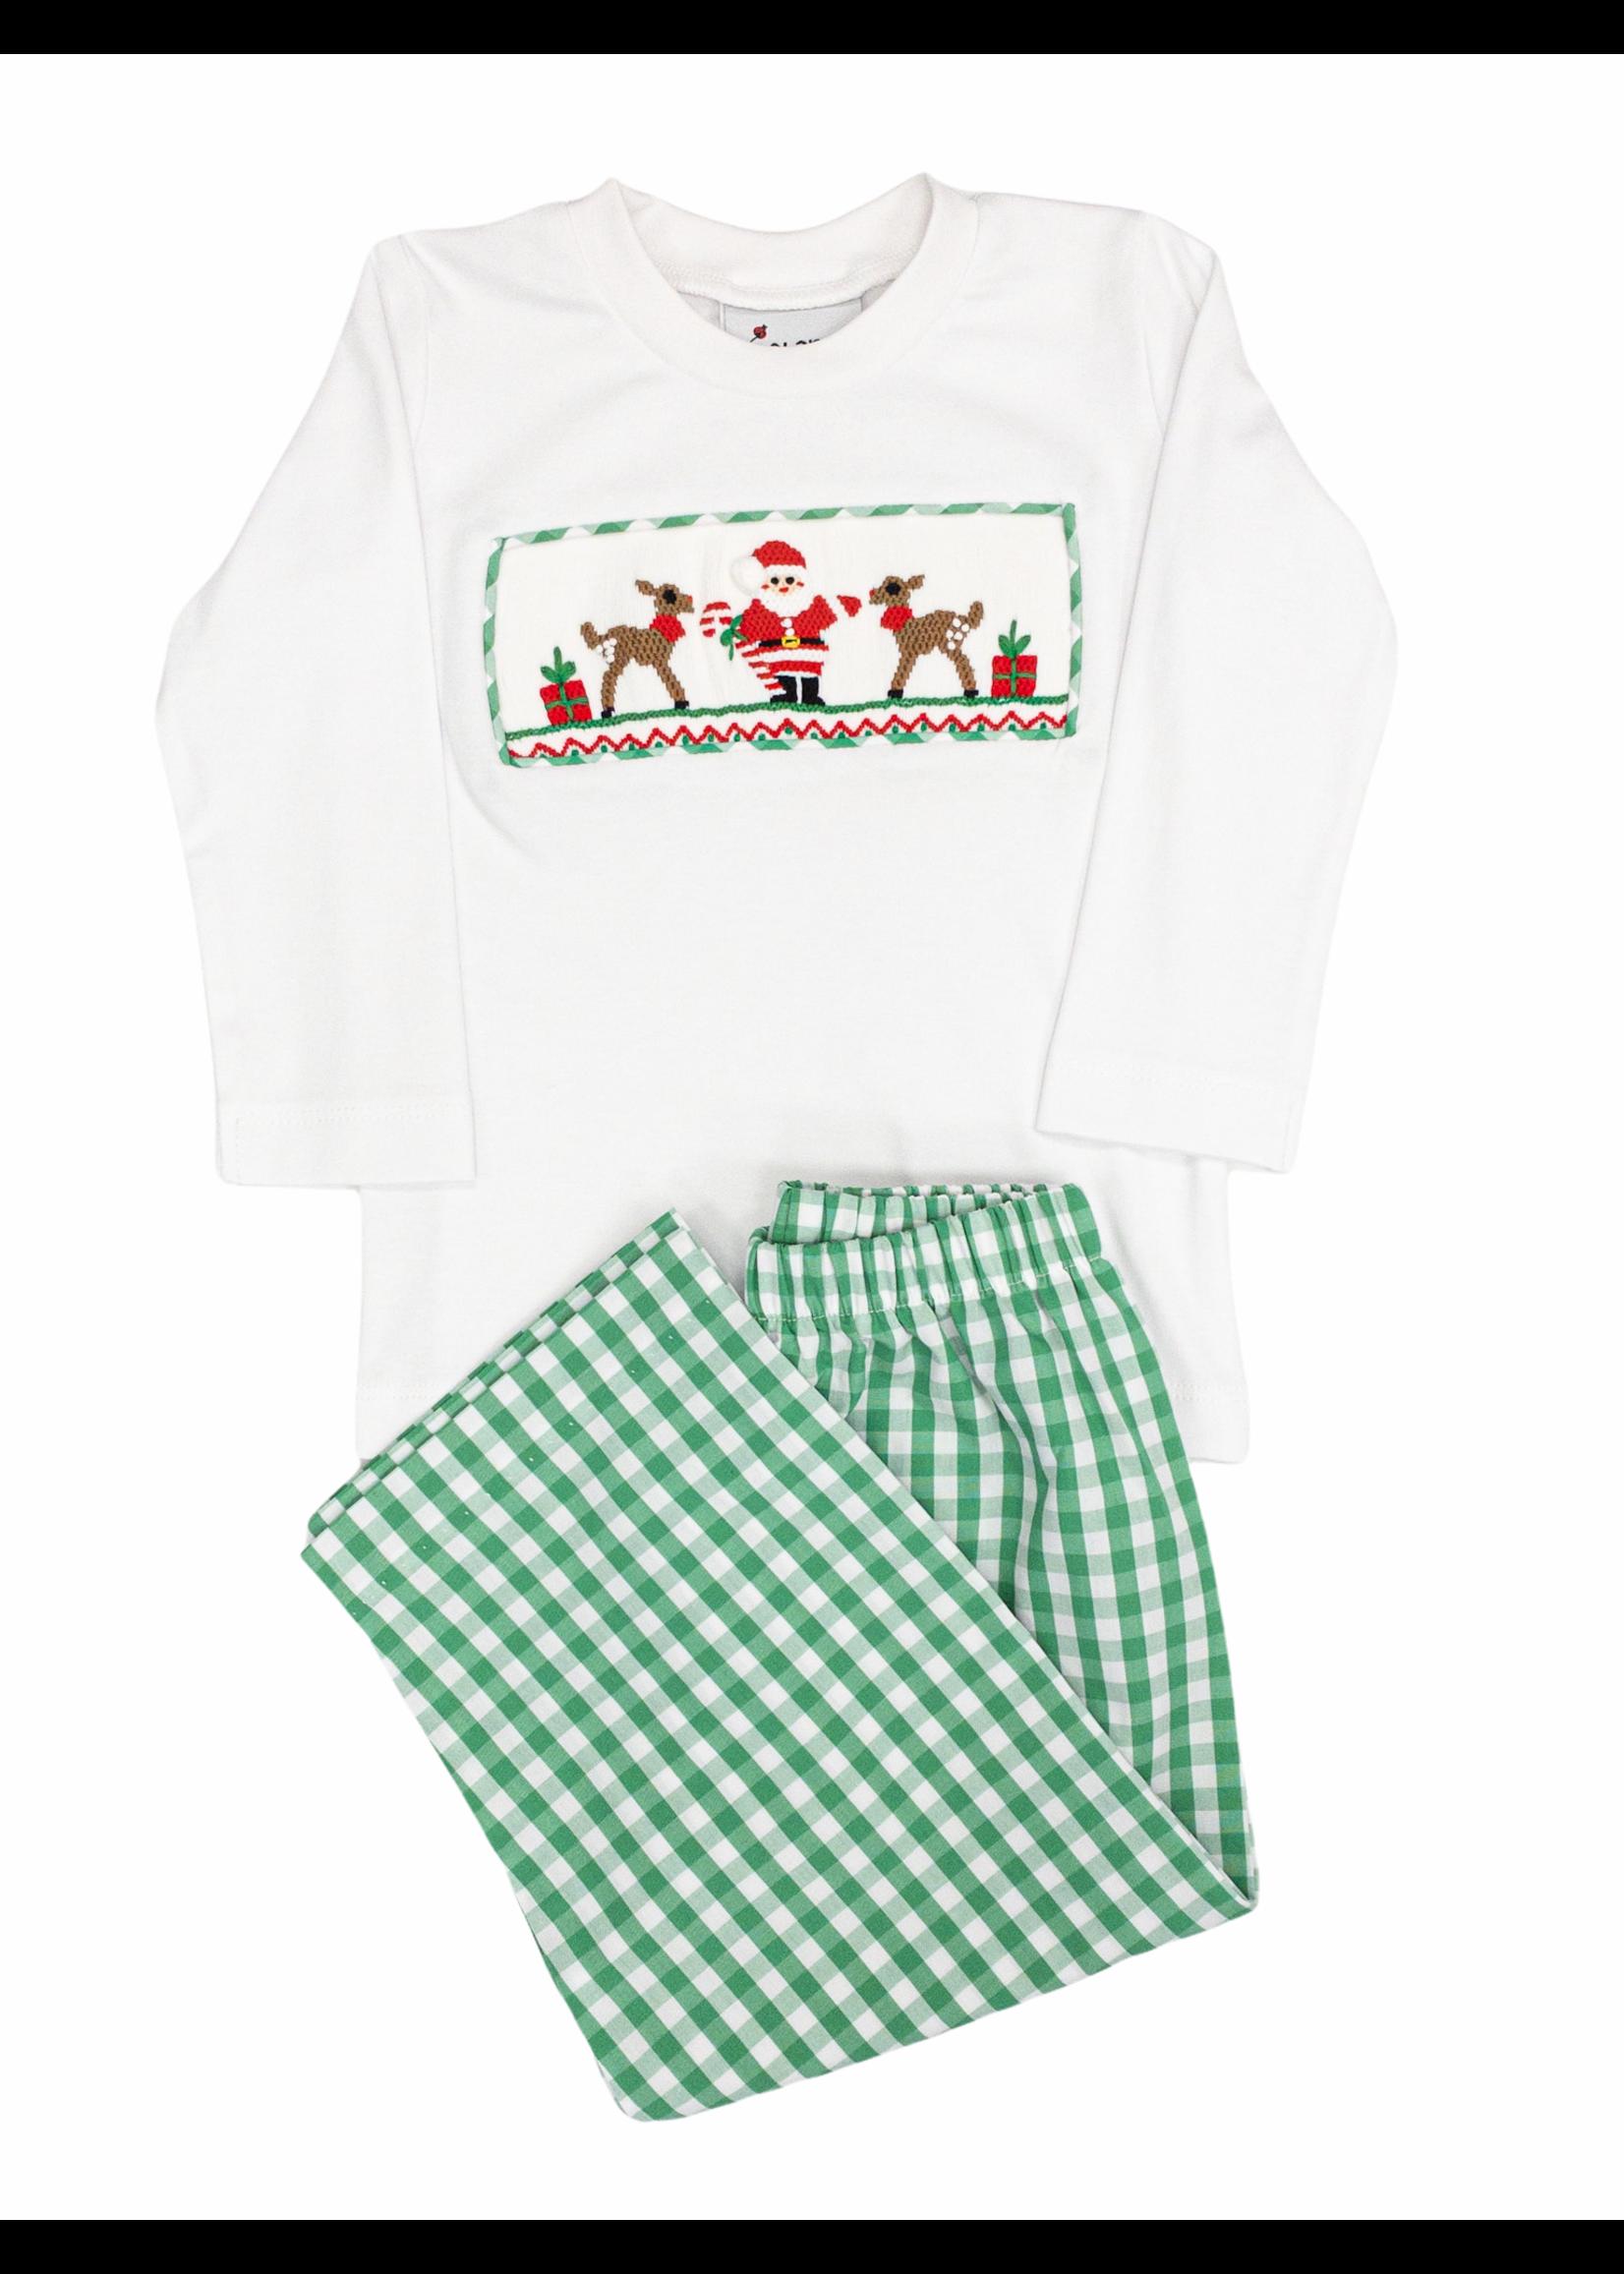 Delaney Green Check Pant Smocked Santa & Reindeer Shirt